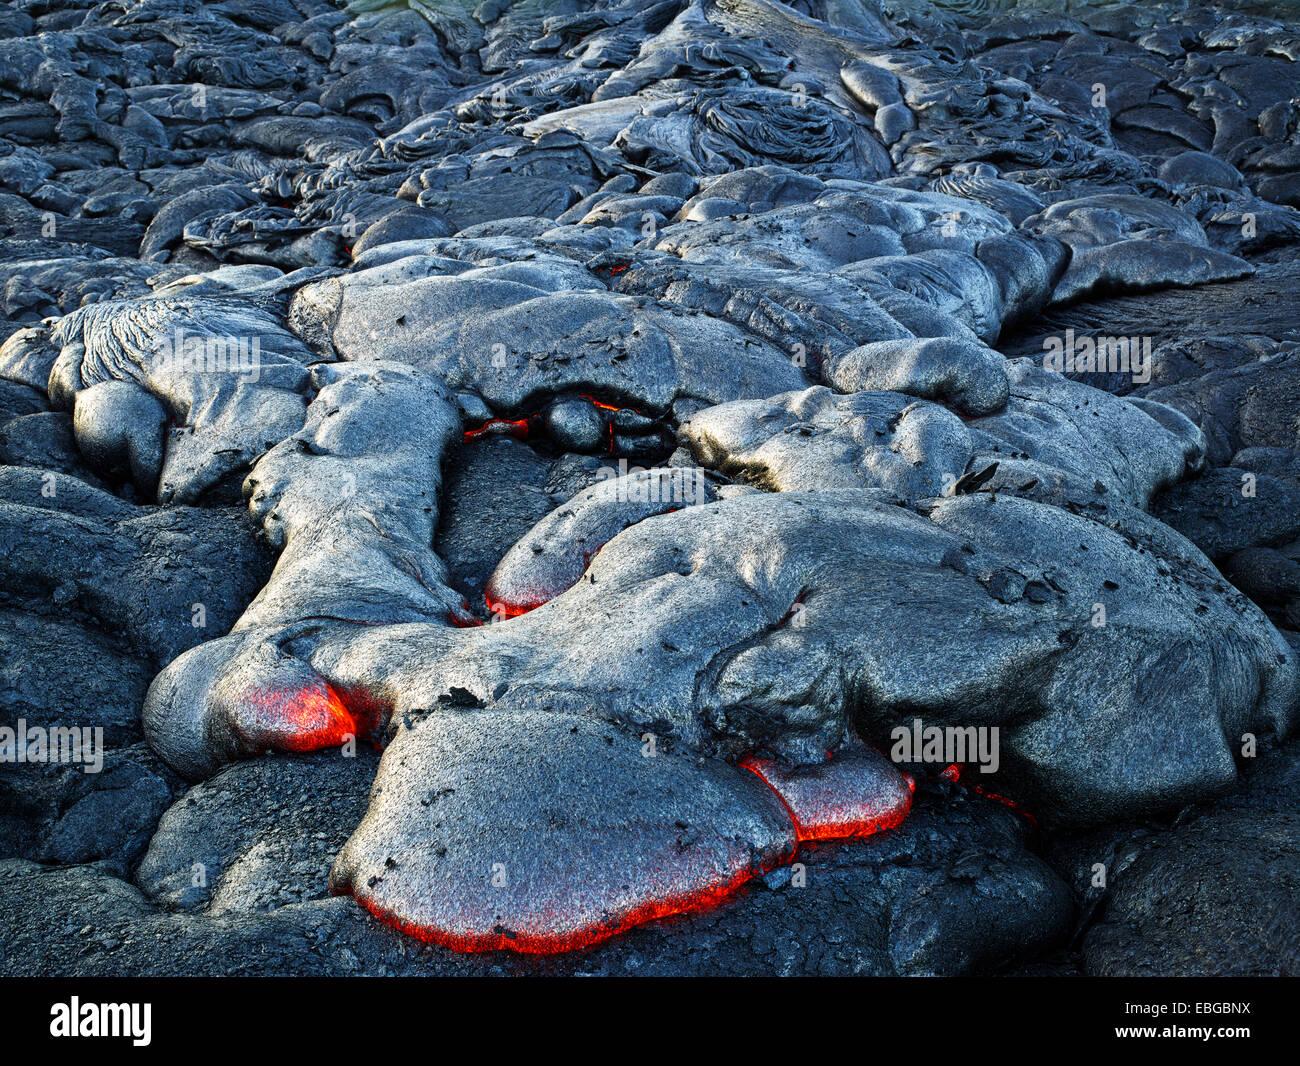 Puʻu ʻŌʻō or Puu Oo volcano, volcanic eruption, lava, red hot lava flow, Hawaiʻi-Volcanoes-Nationalpark, USA, Hawaii - Stock Image